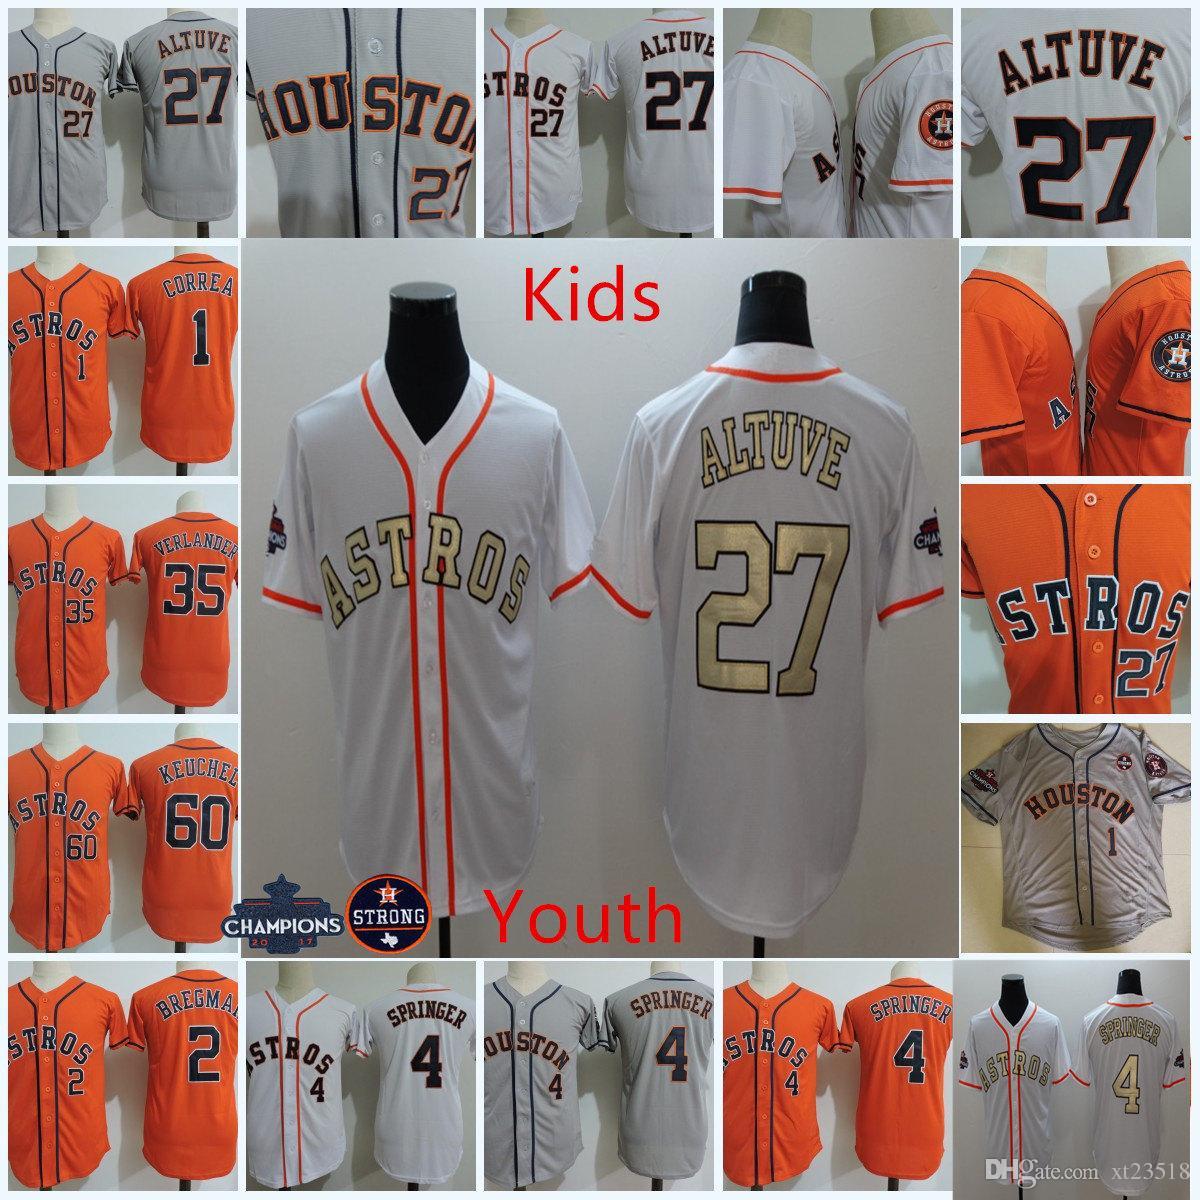 timeless design b8060 402b6 Youth #4 George Springer Jersey Kids #1 Carlos Correa #2 Alex Bregman #35  Justin Verlander #27 Jose Altuve Jersey S-3XL